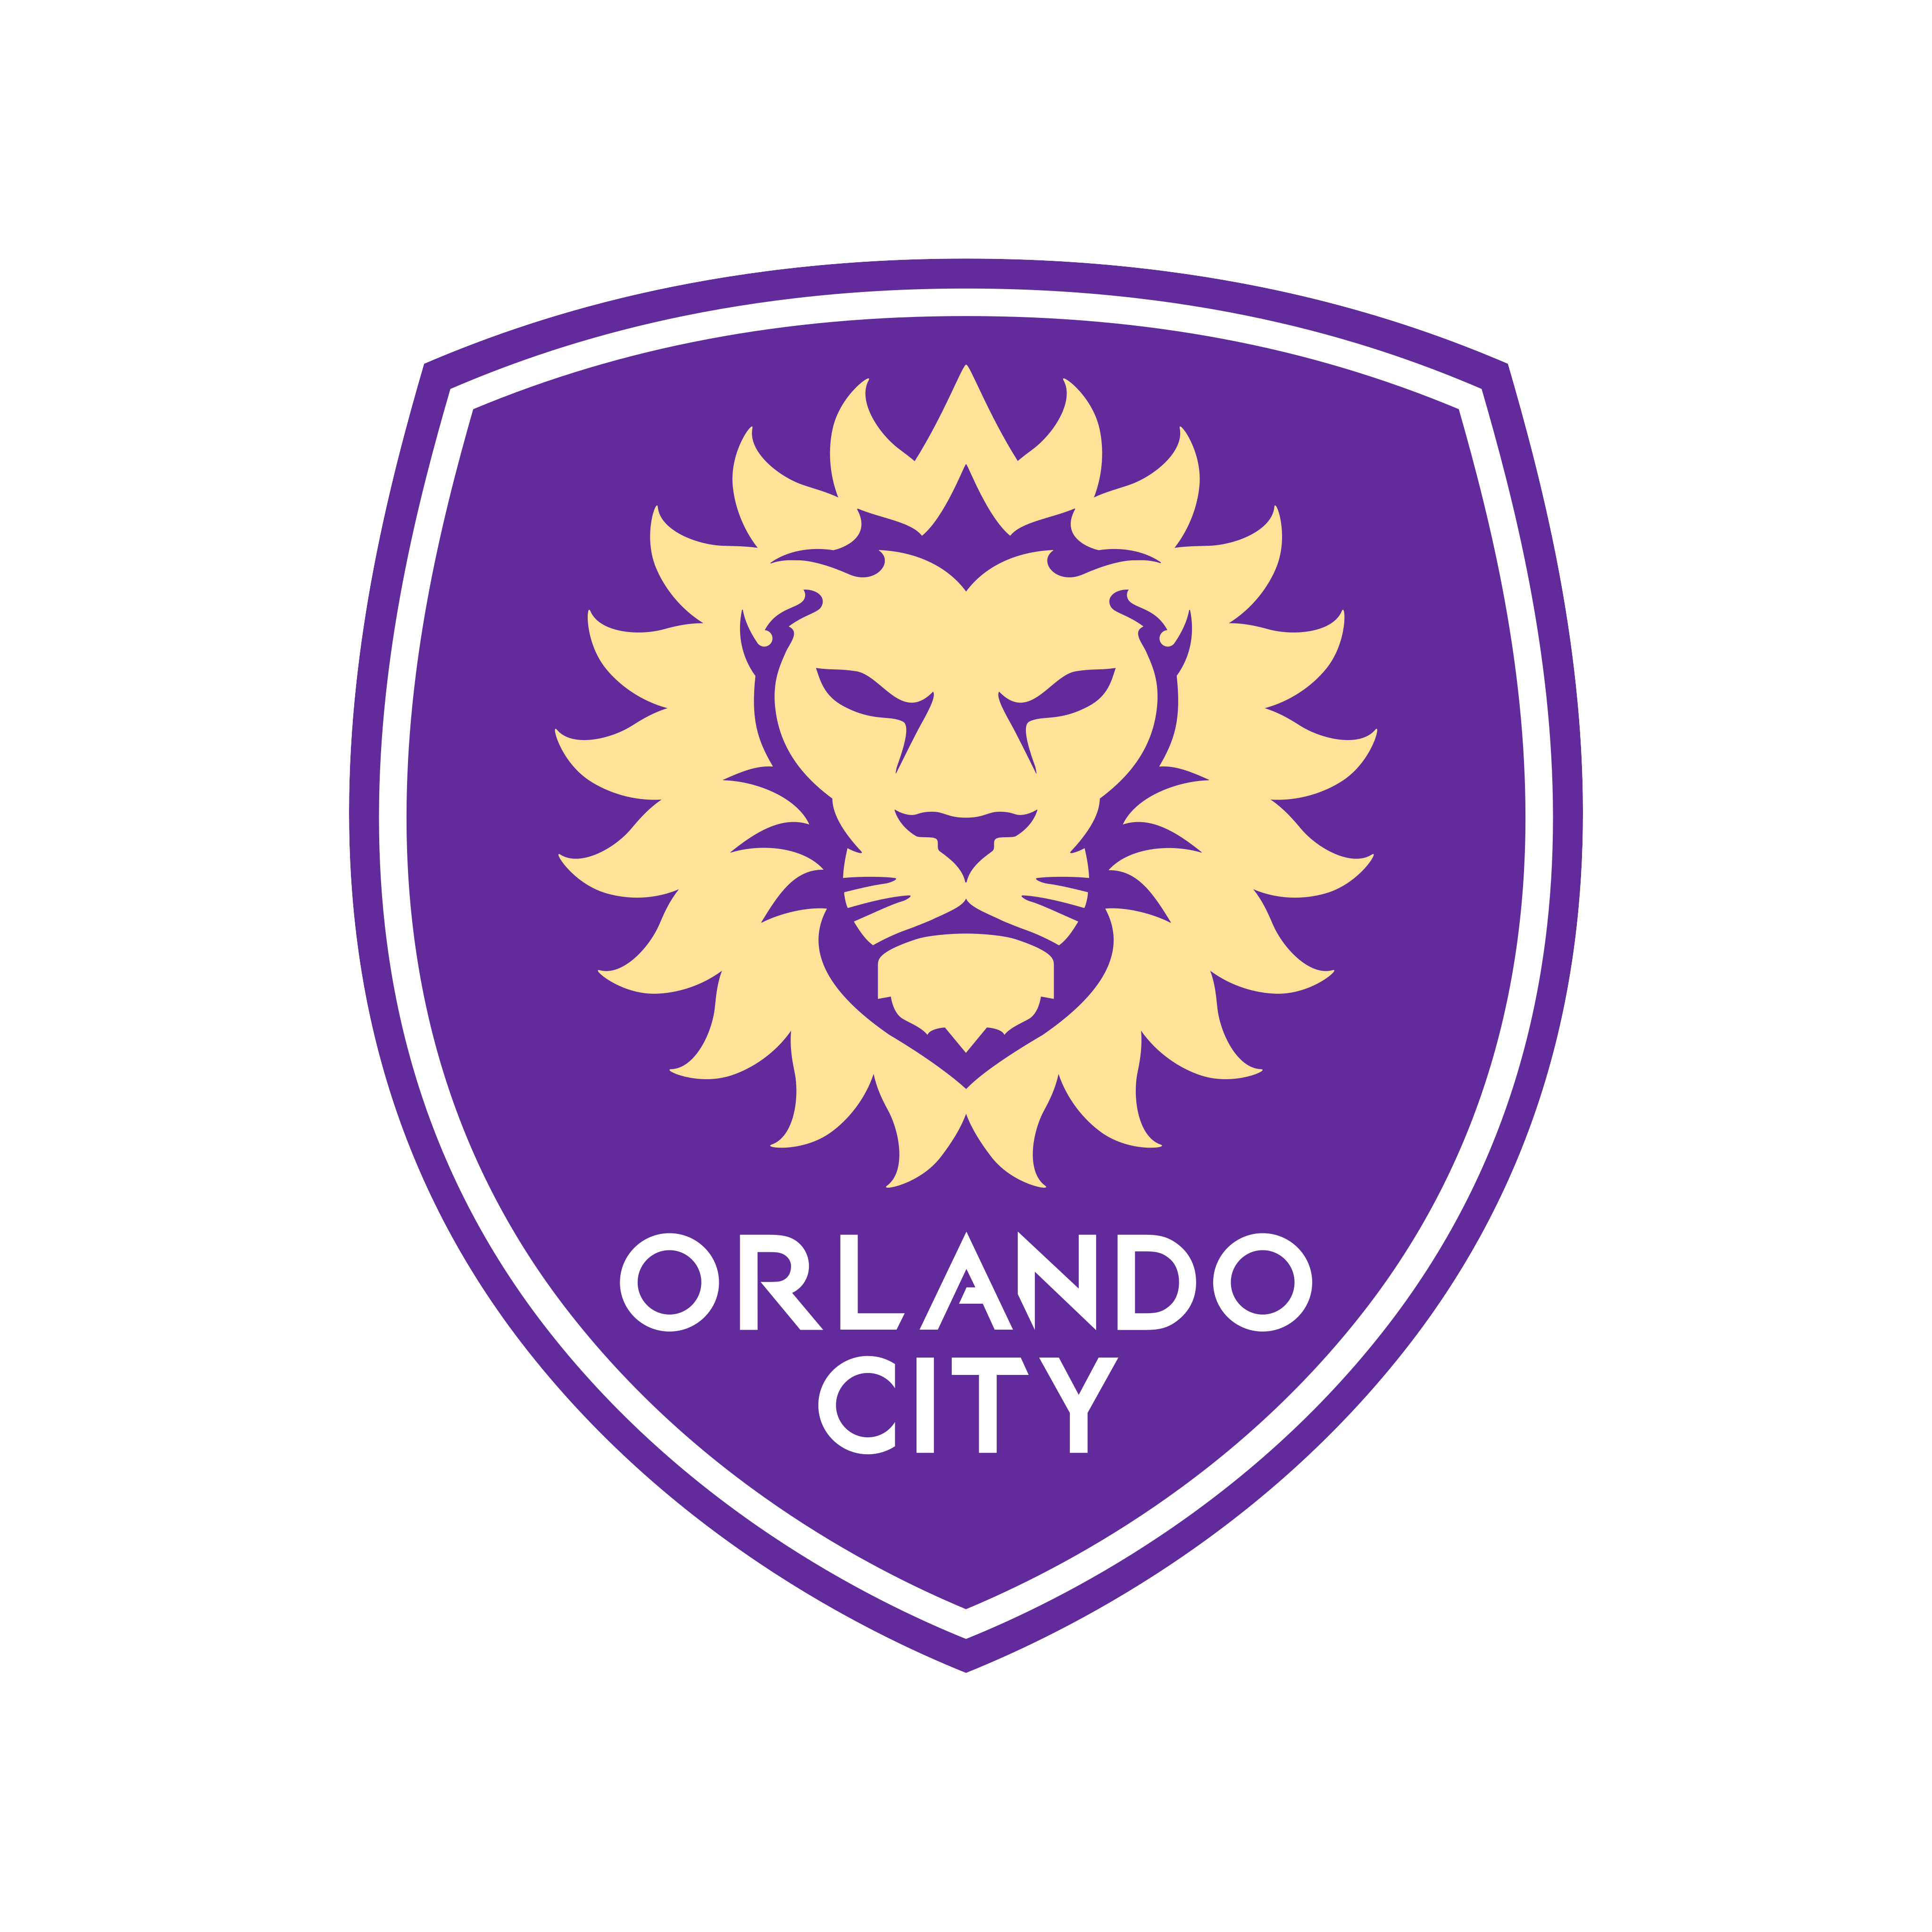 orlando city sc logo 0 - Orlando City SC Logo